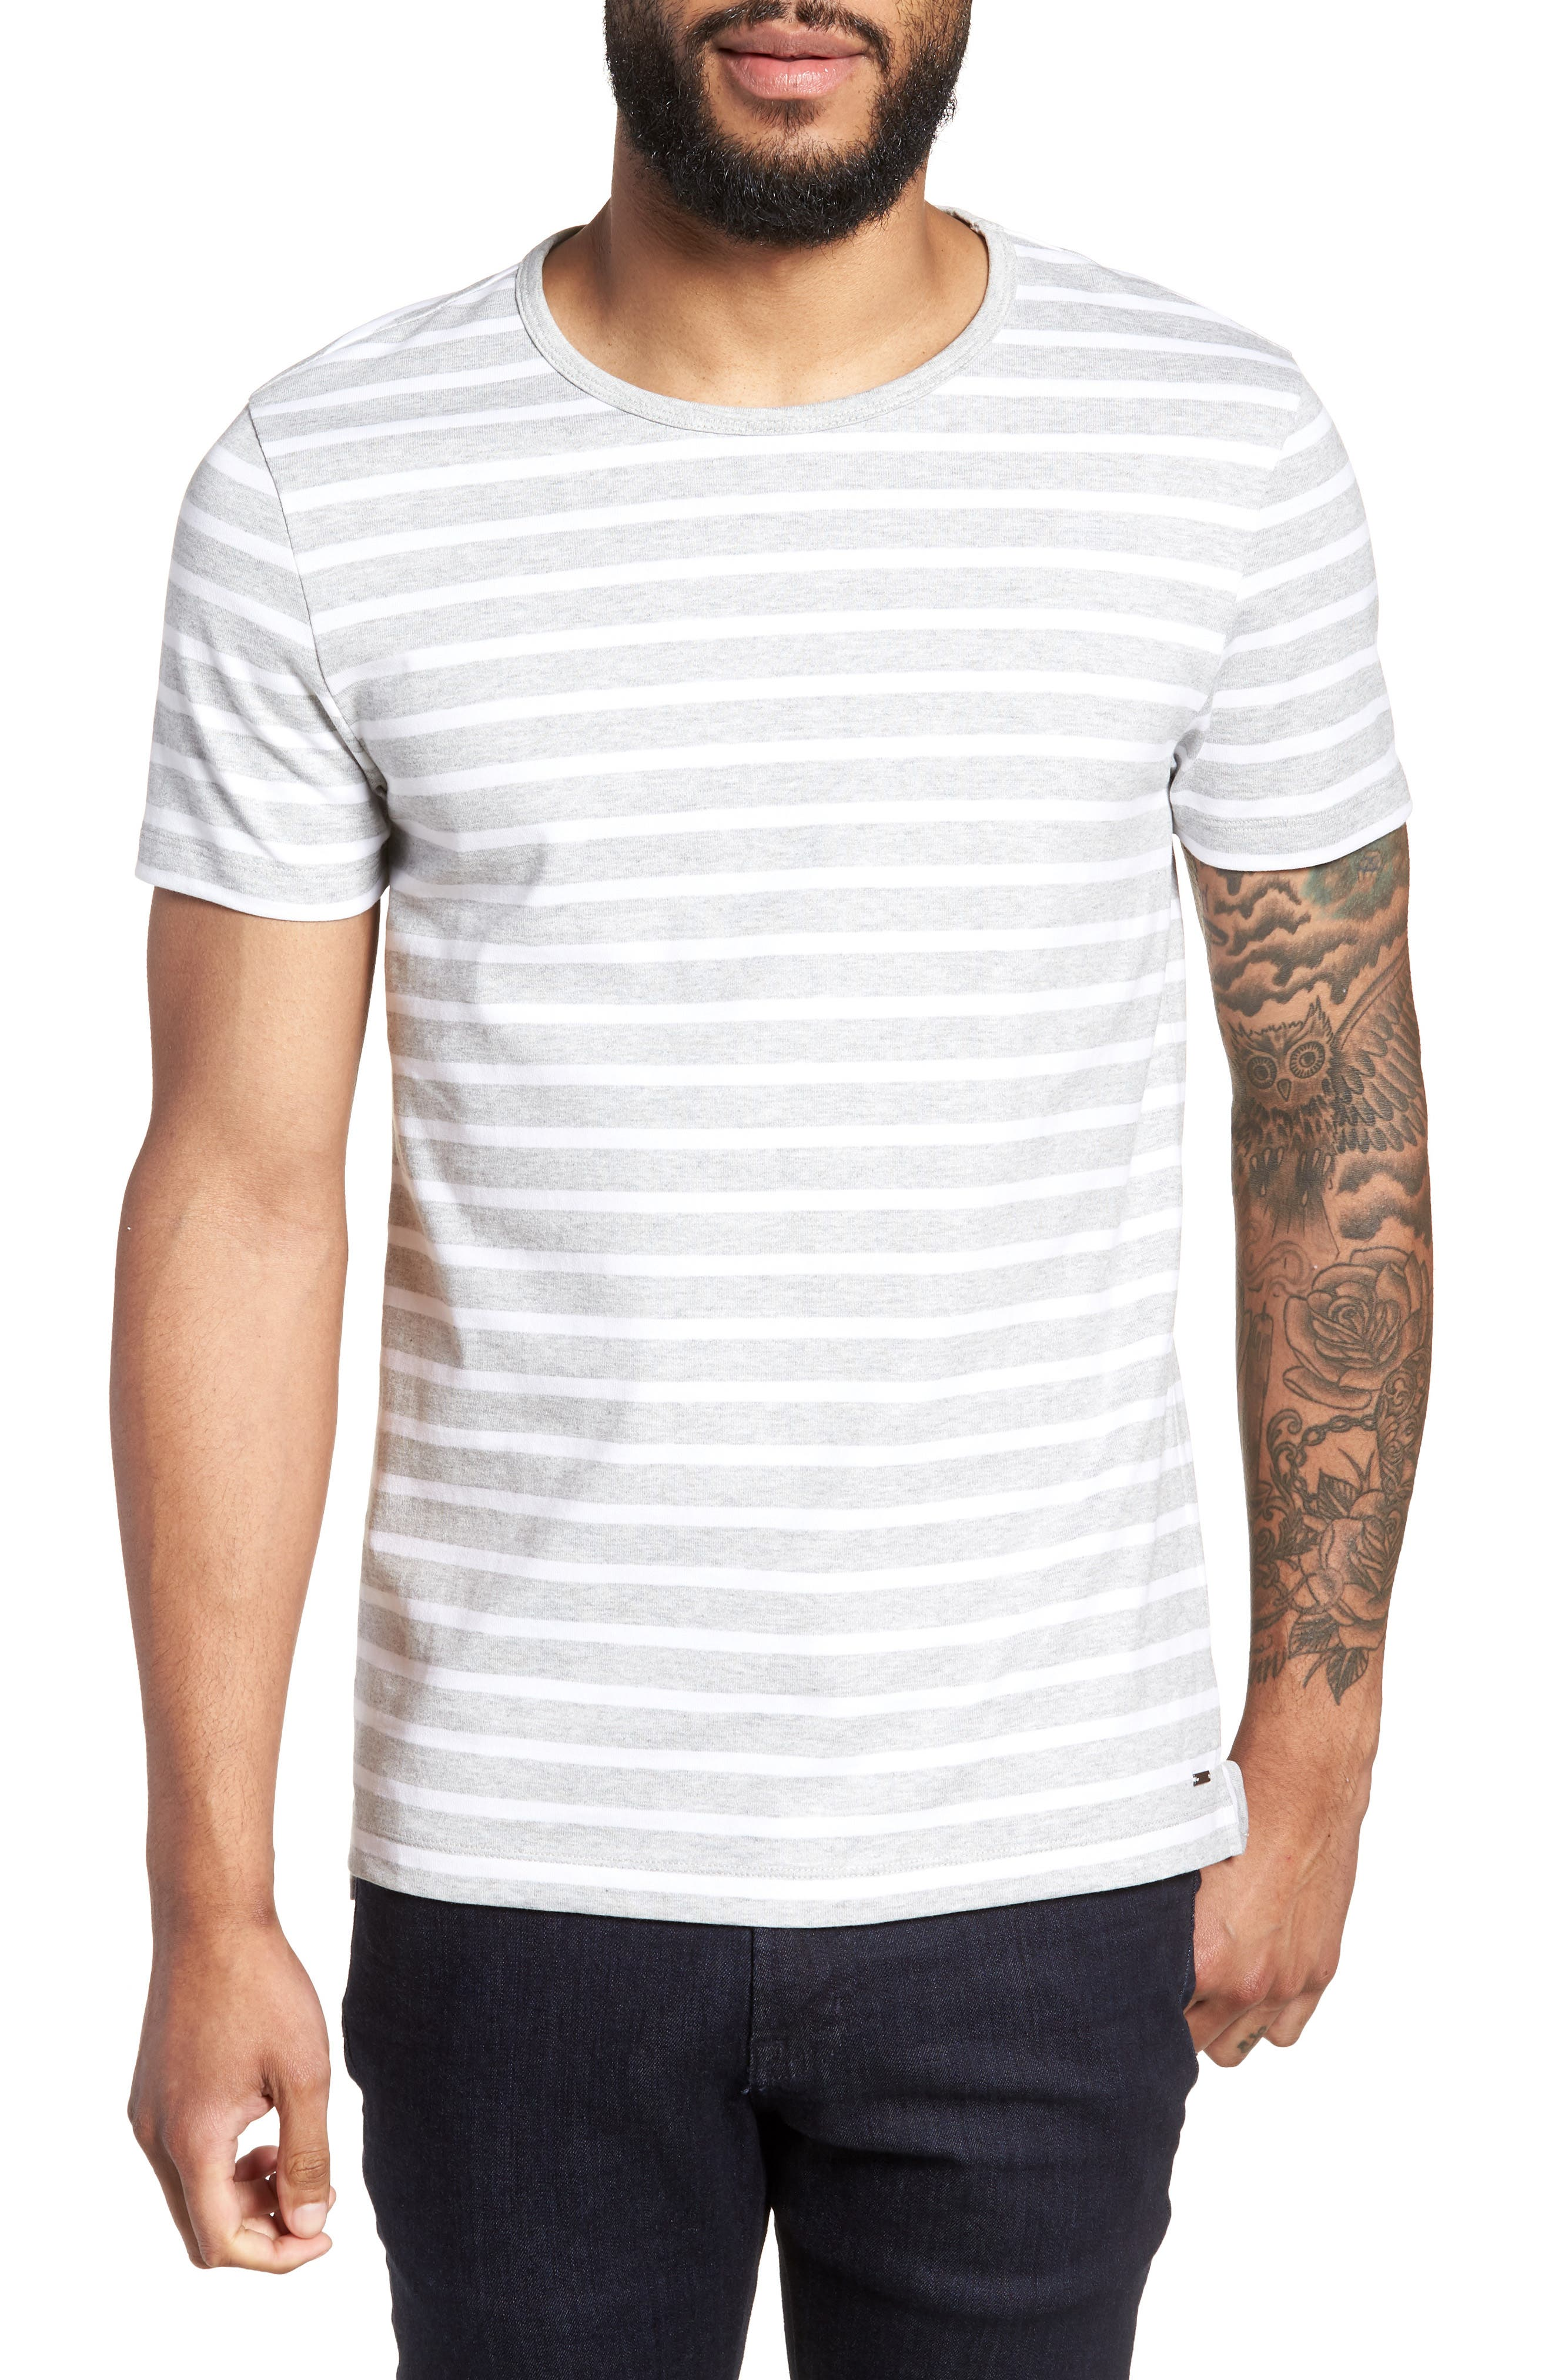 Tessler Slim Fit Crewneck T-Shirt,                             Main thumbnail 1, color,                             Grey